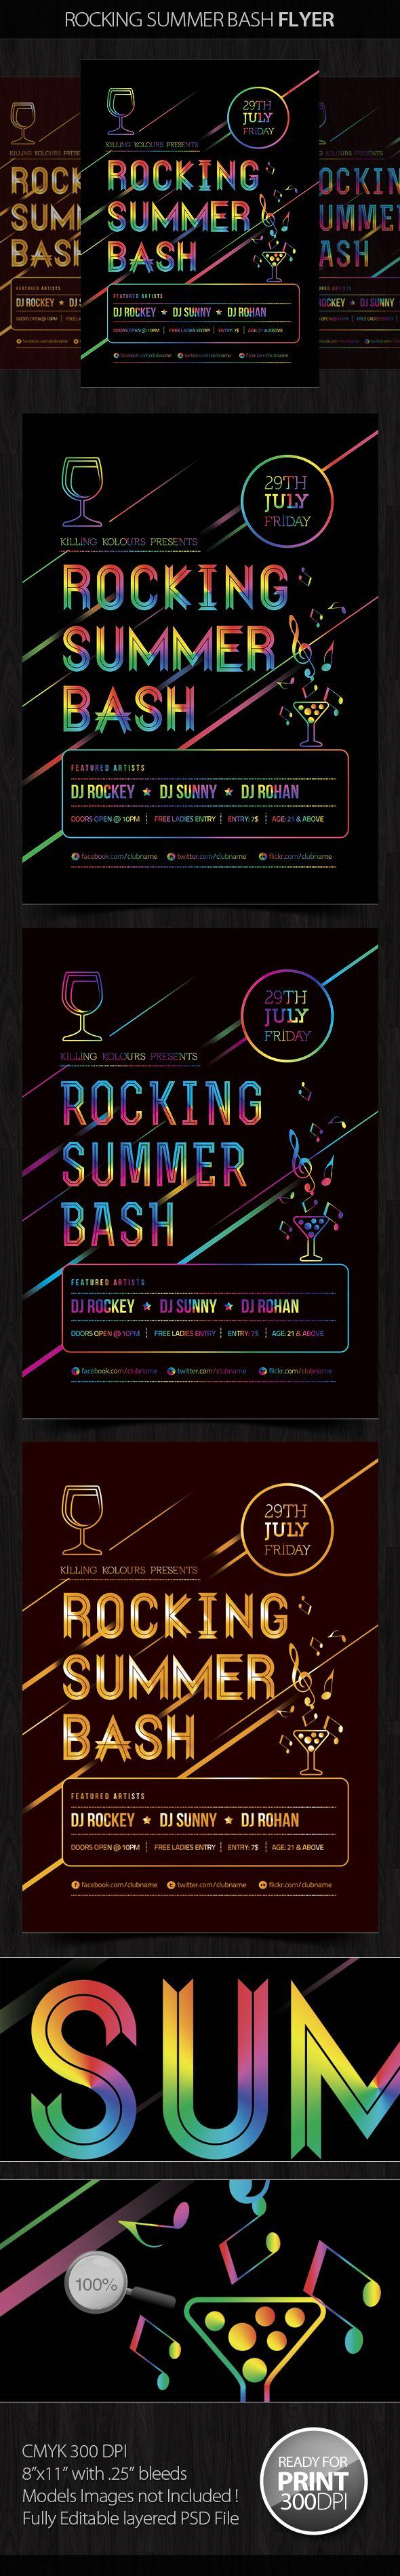 Rocking Summer Bash Party Flyer by Mahantesh Nagashetty, via Behance